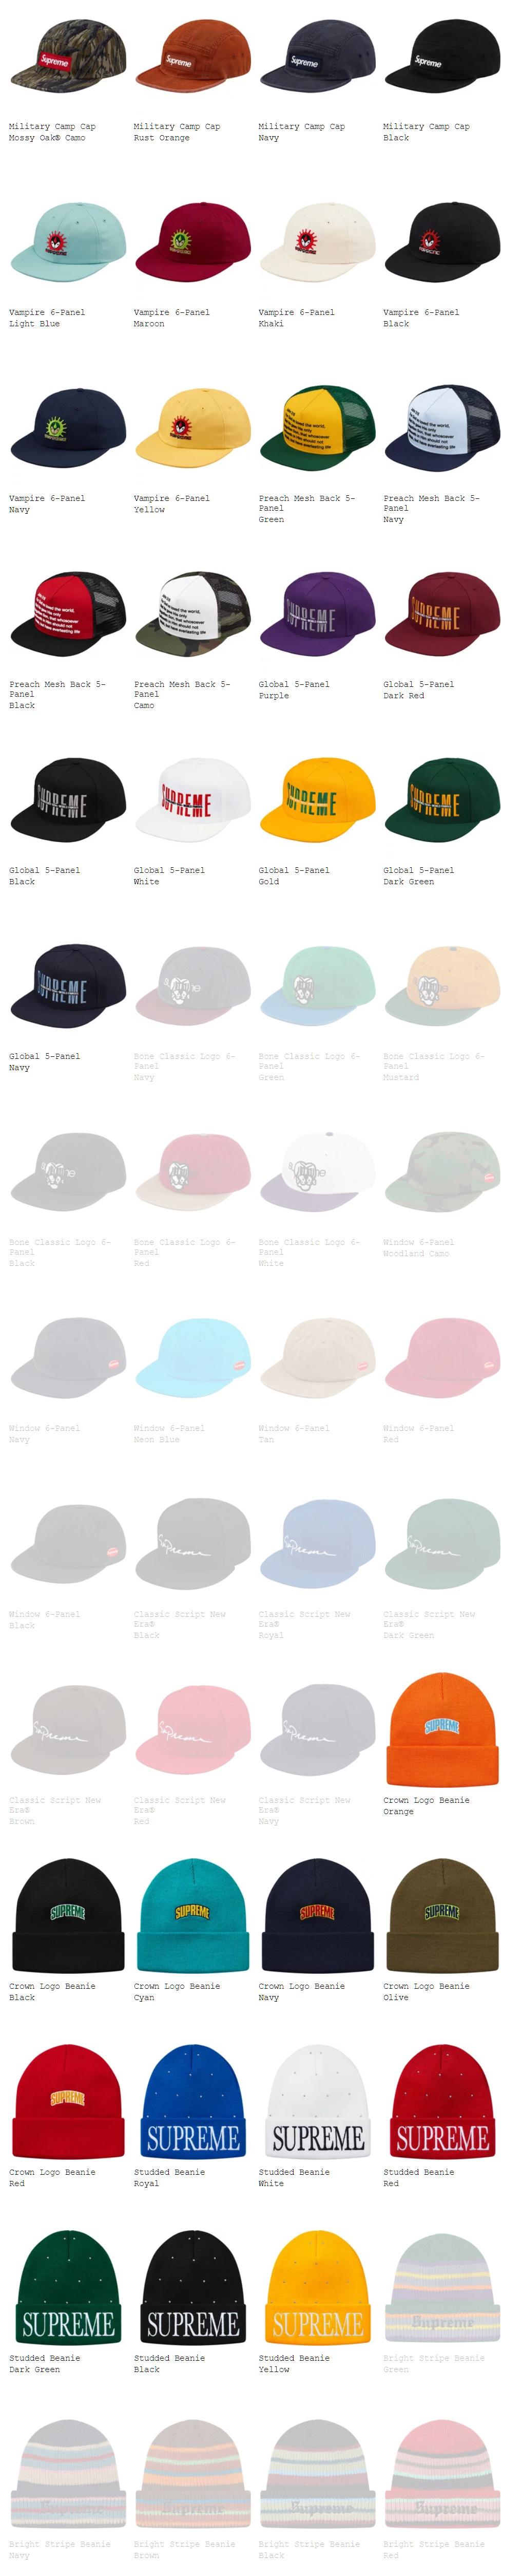 supreme シュプリーム 18fw week2 オンライン配置 帽子